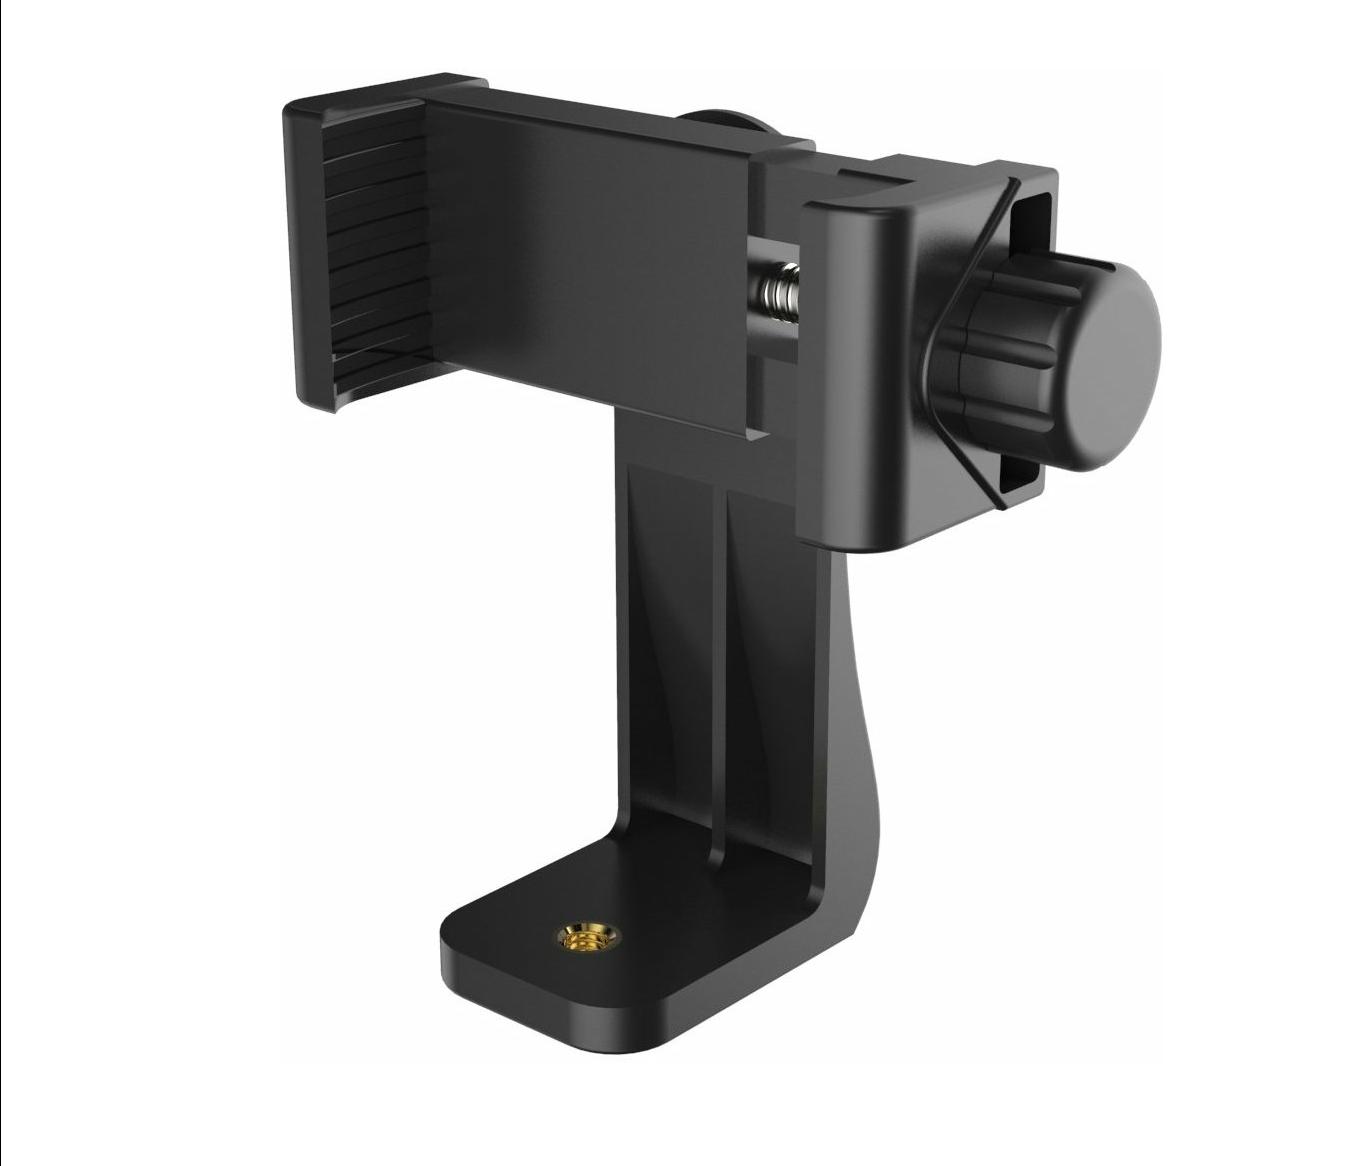 Cell Phone Tripod Mount Adapter $4.89AC @ Amazon